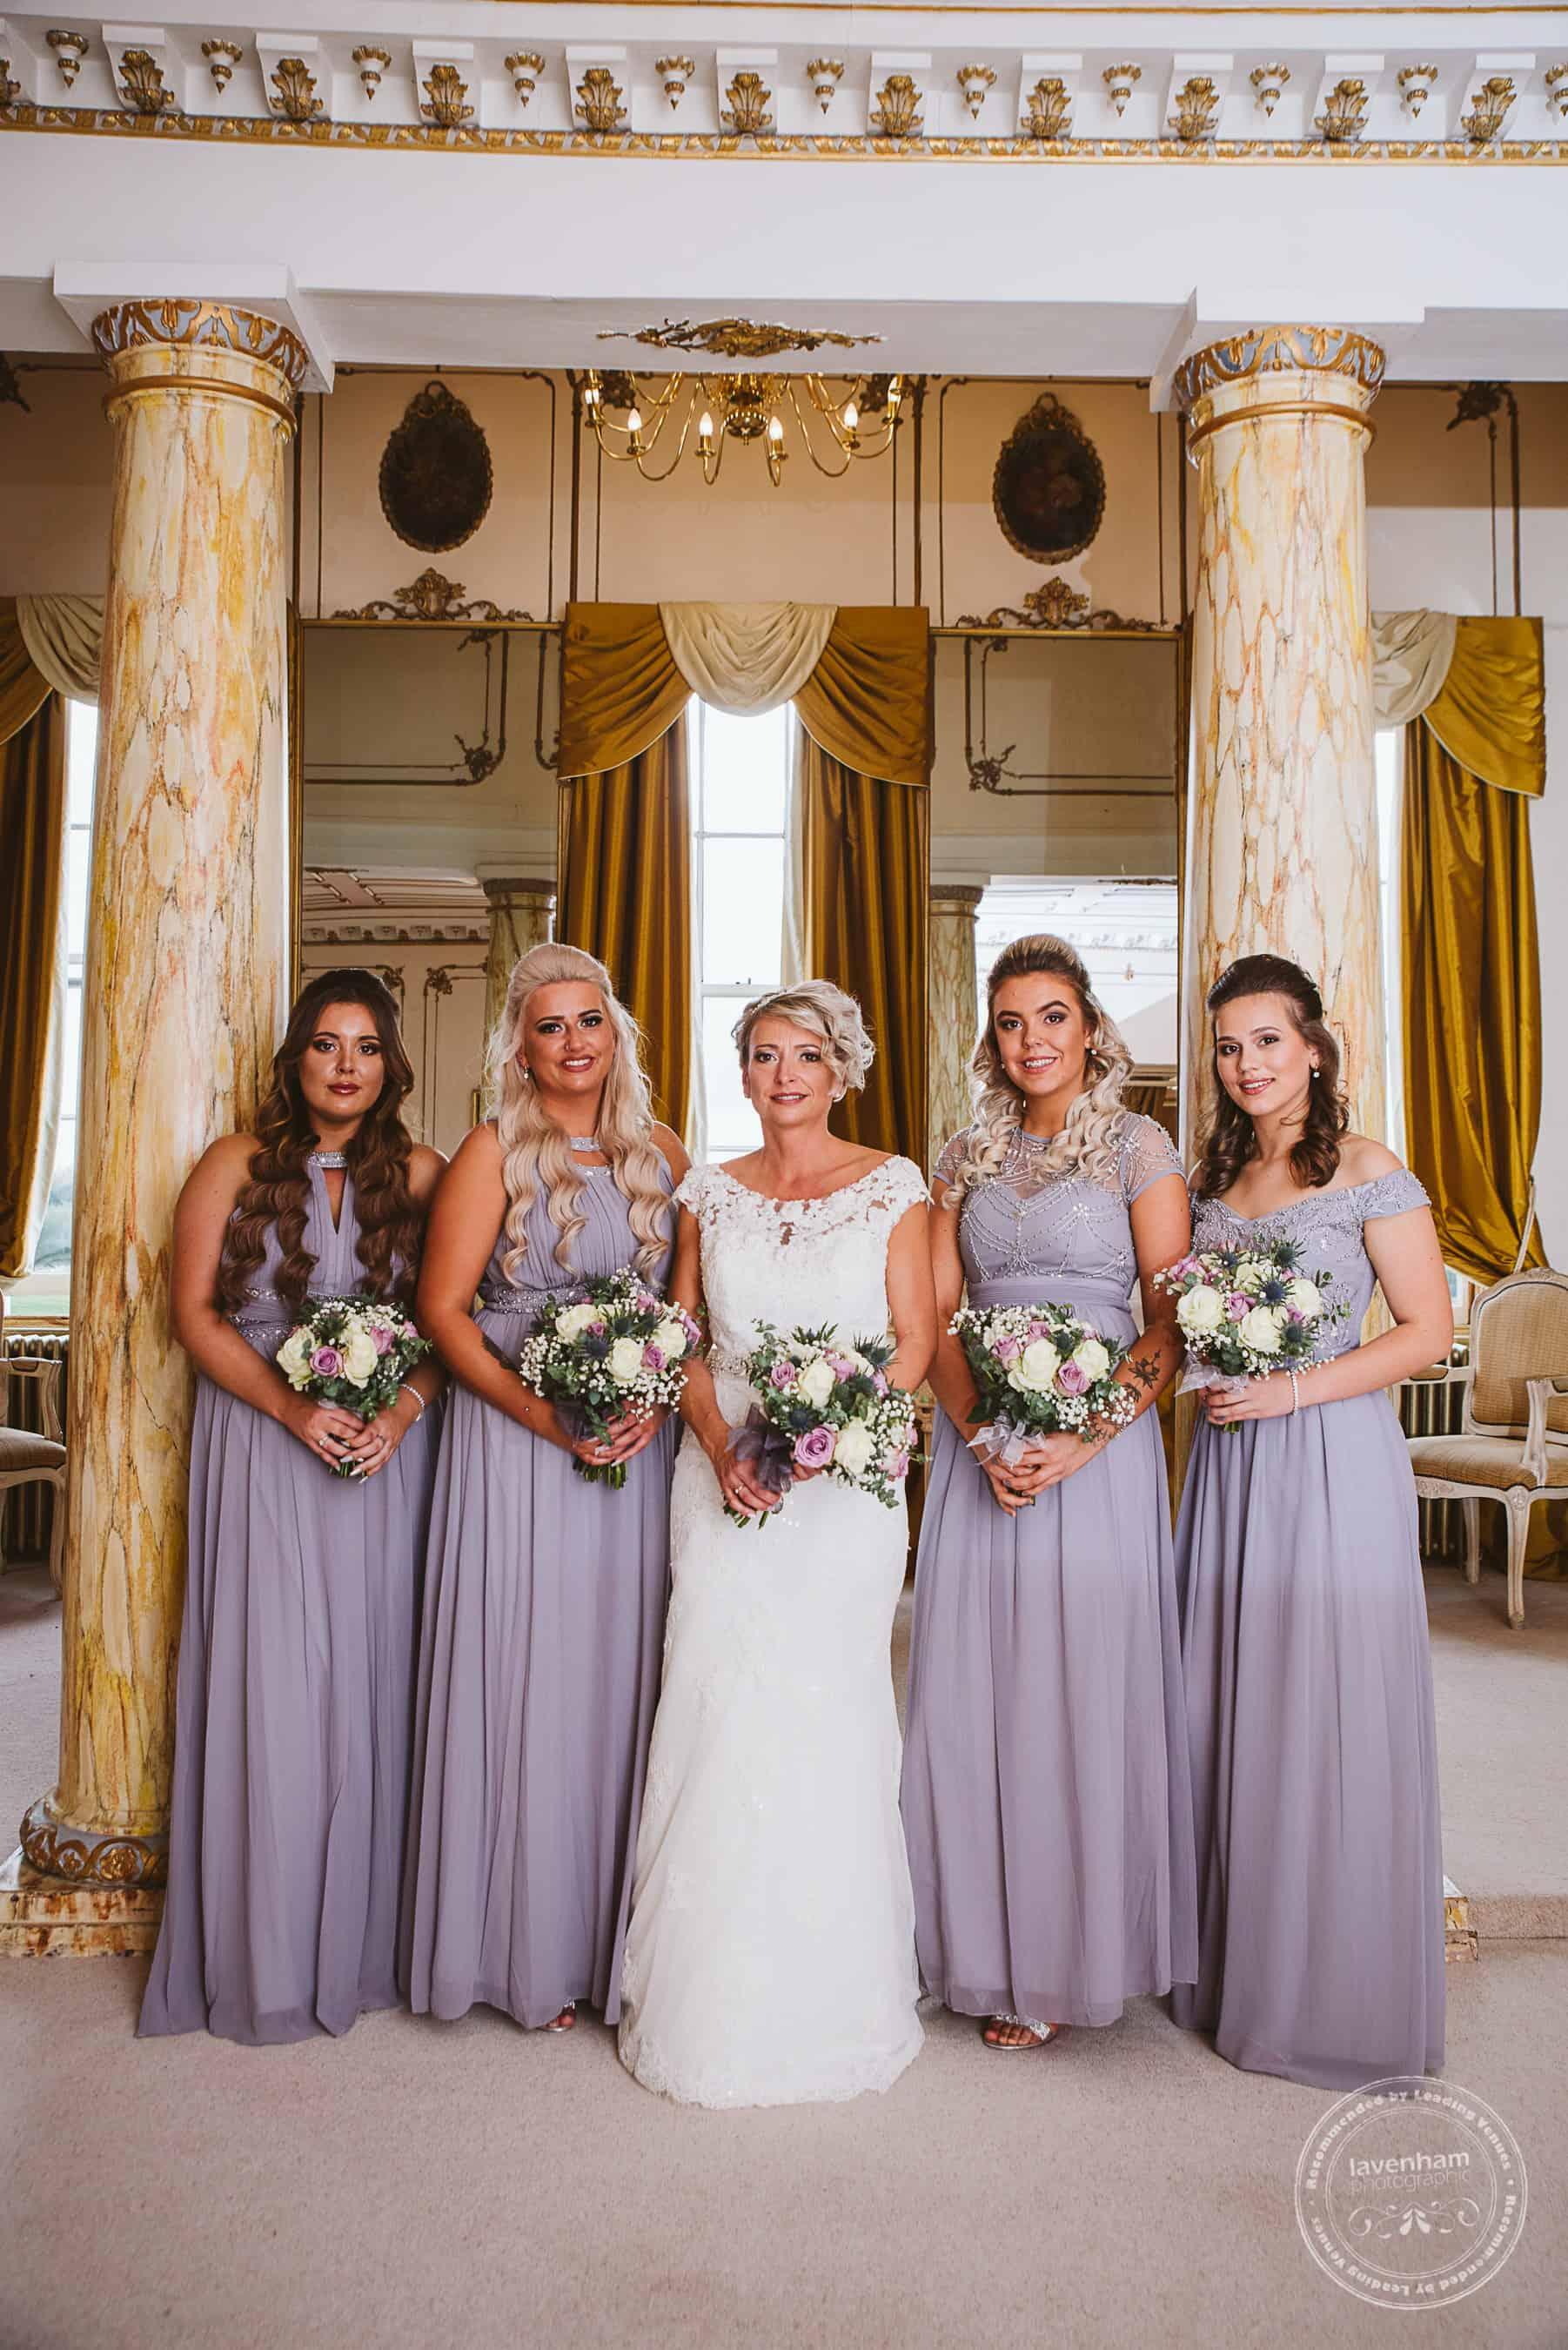 281018 Gosfield Hall Wedding Photography Lavenham Photographic 038